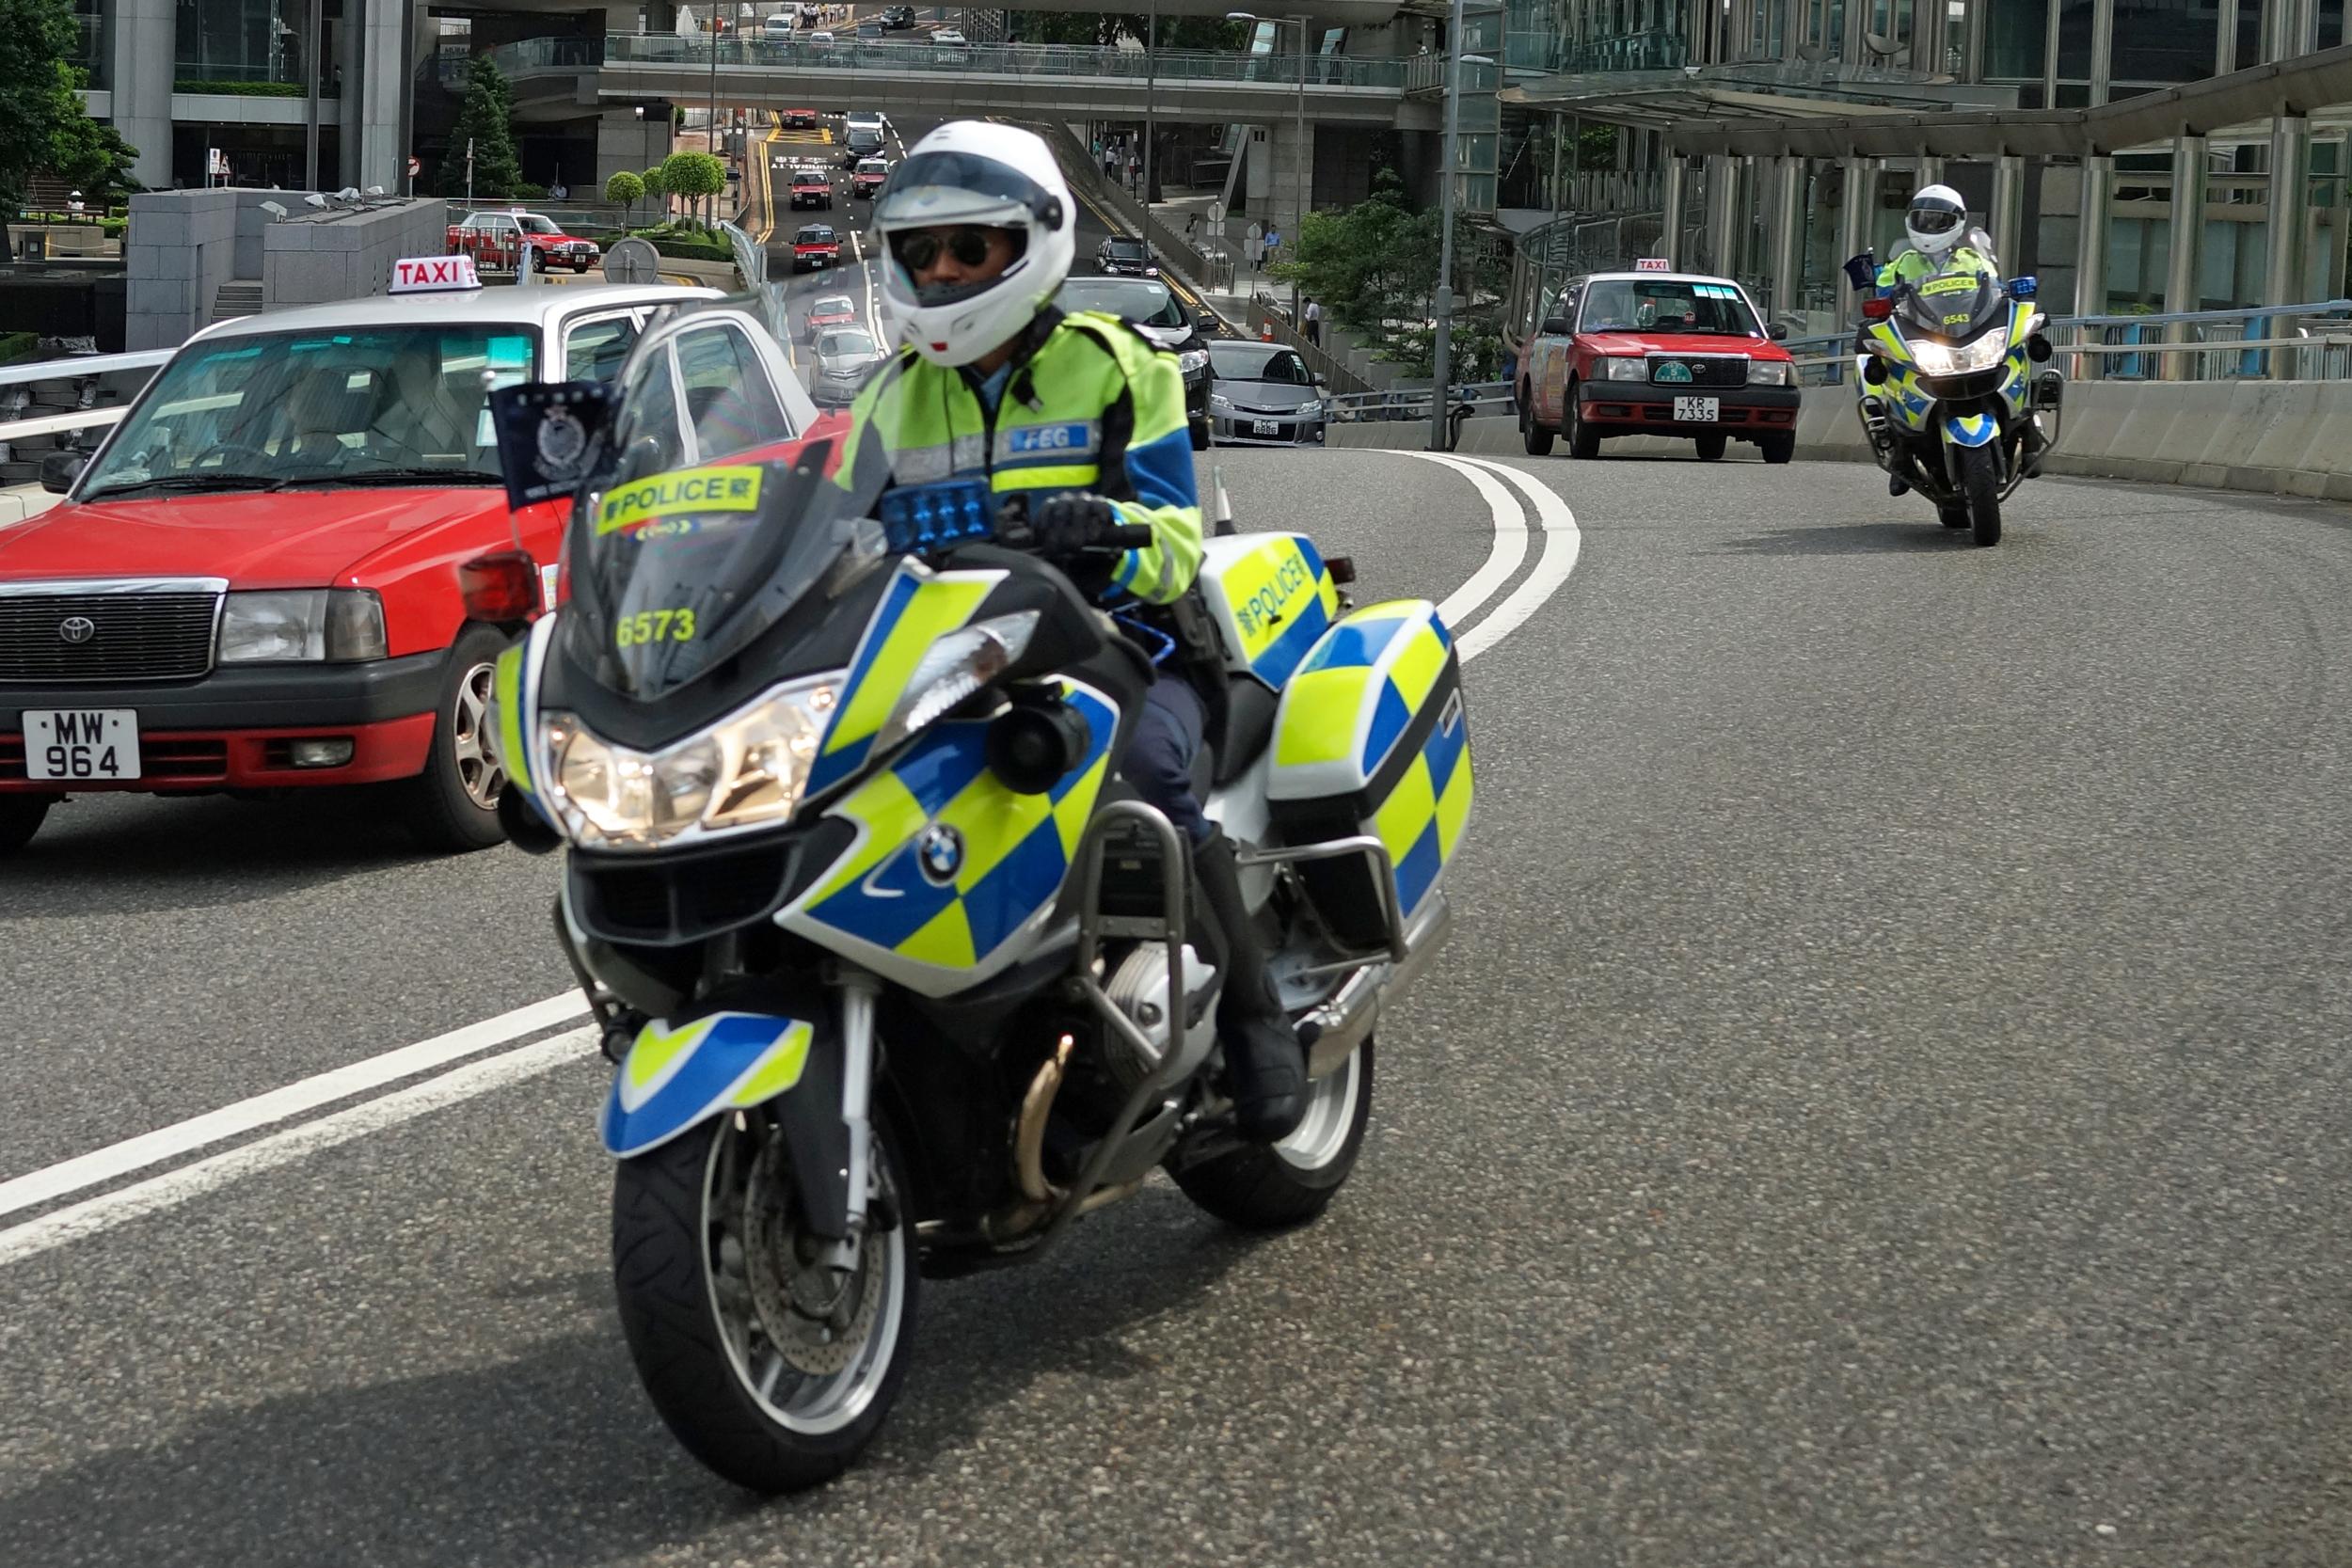 Traffic cops being traffic cops